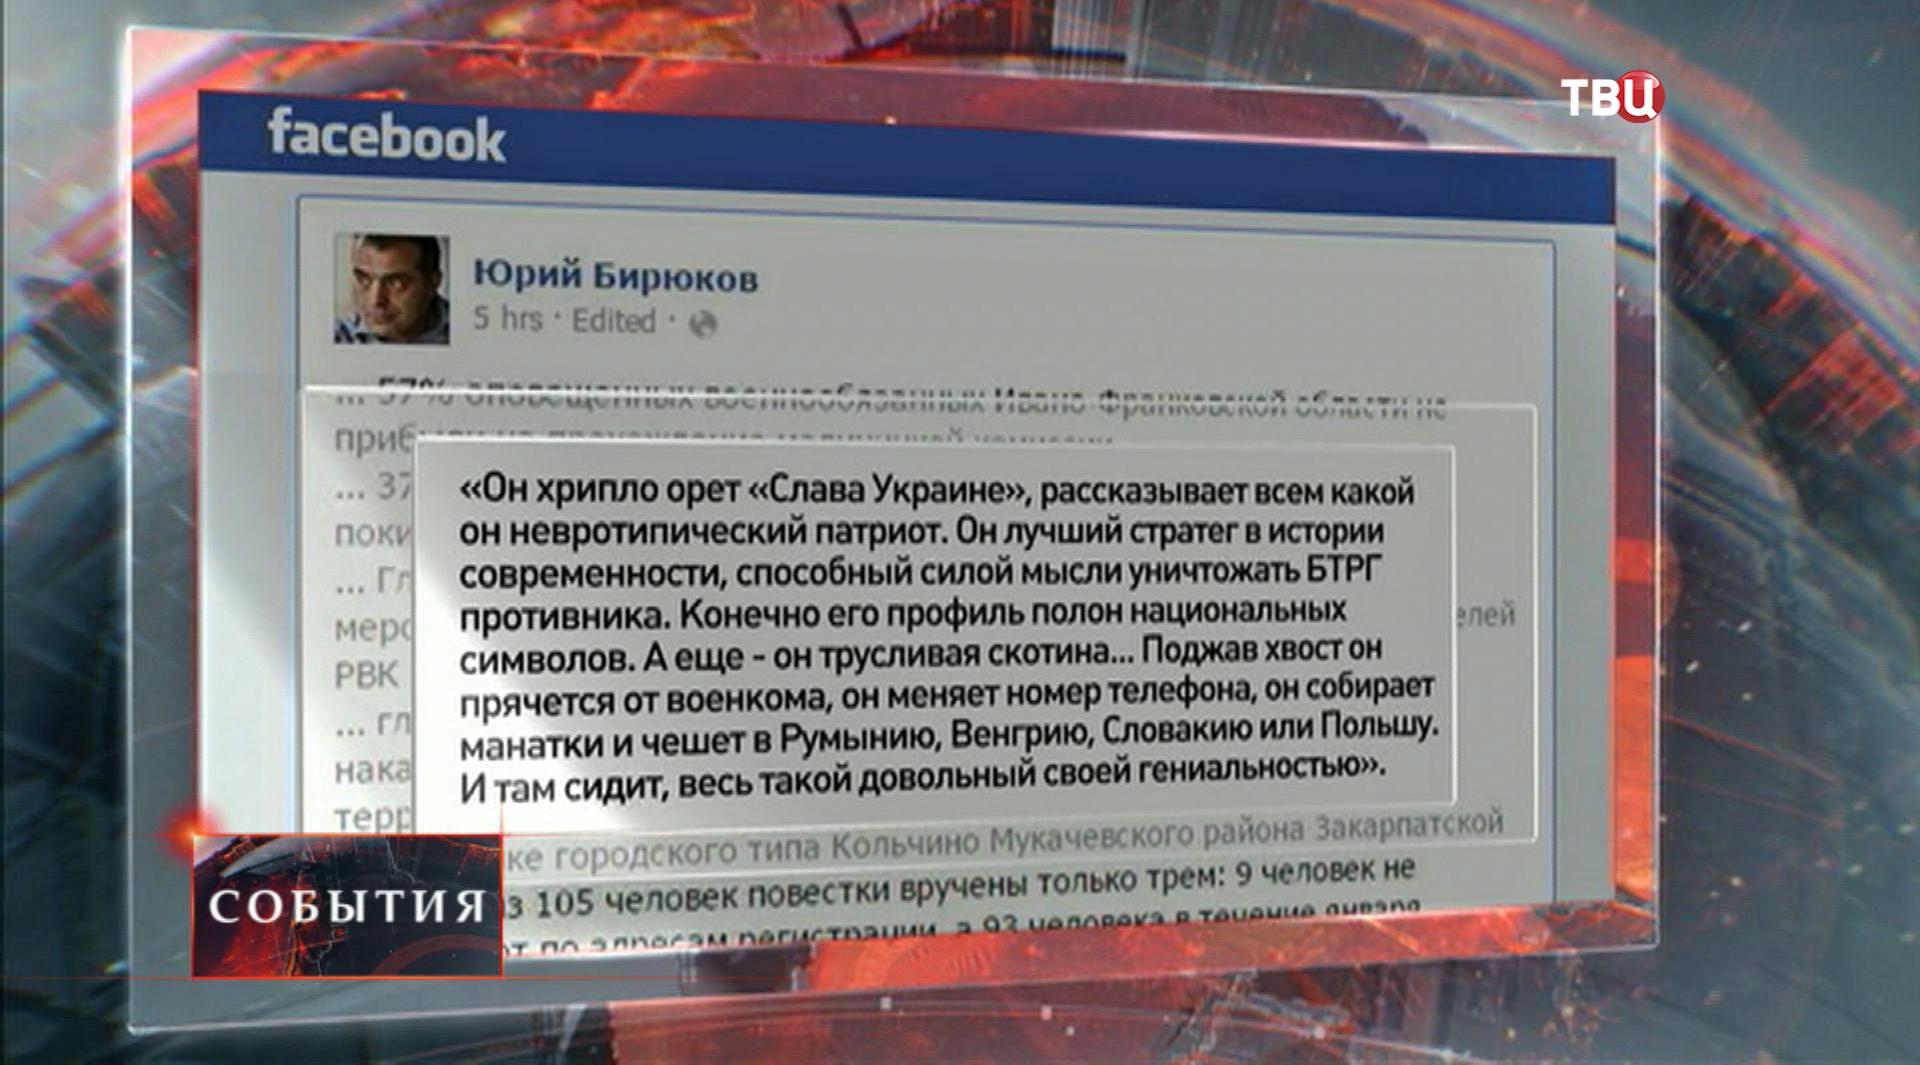 Страничка в Facebook Юрия Бирюкова